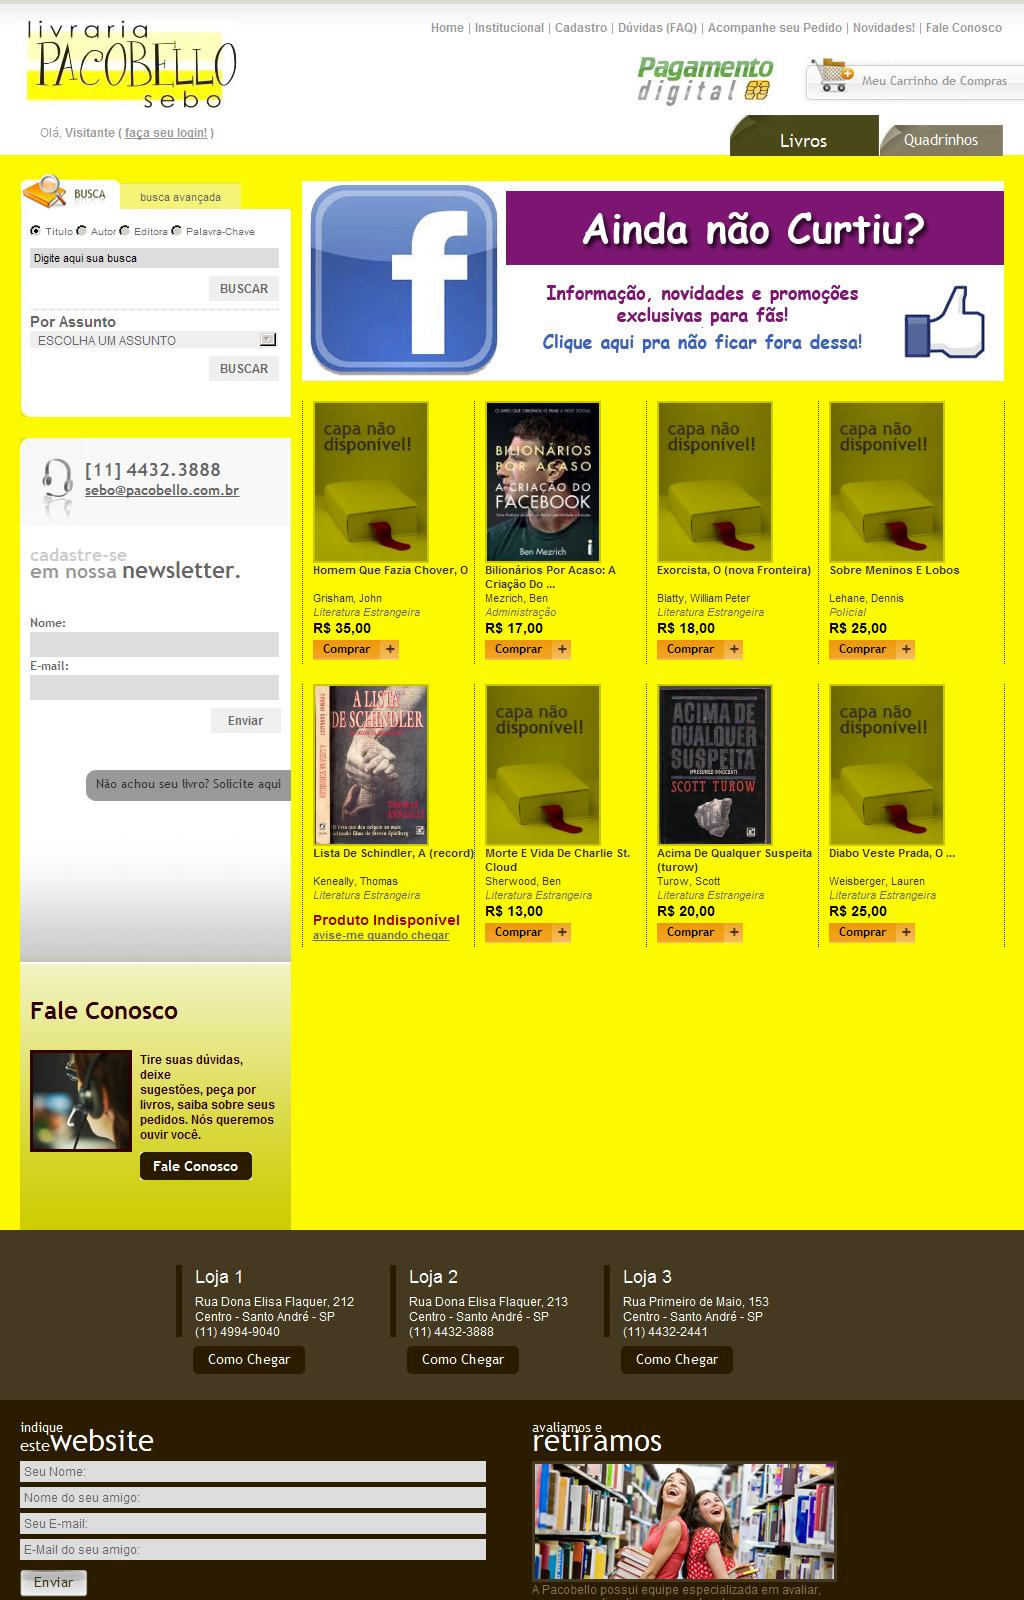 Livros, DVDs, Revistas - Sebo Pacobello